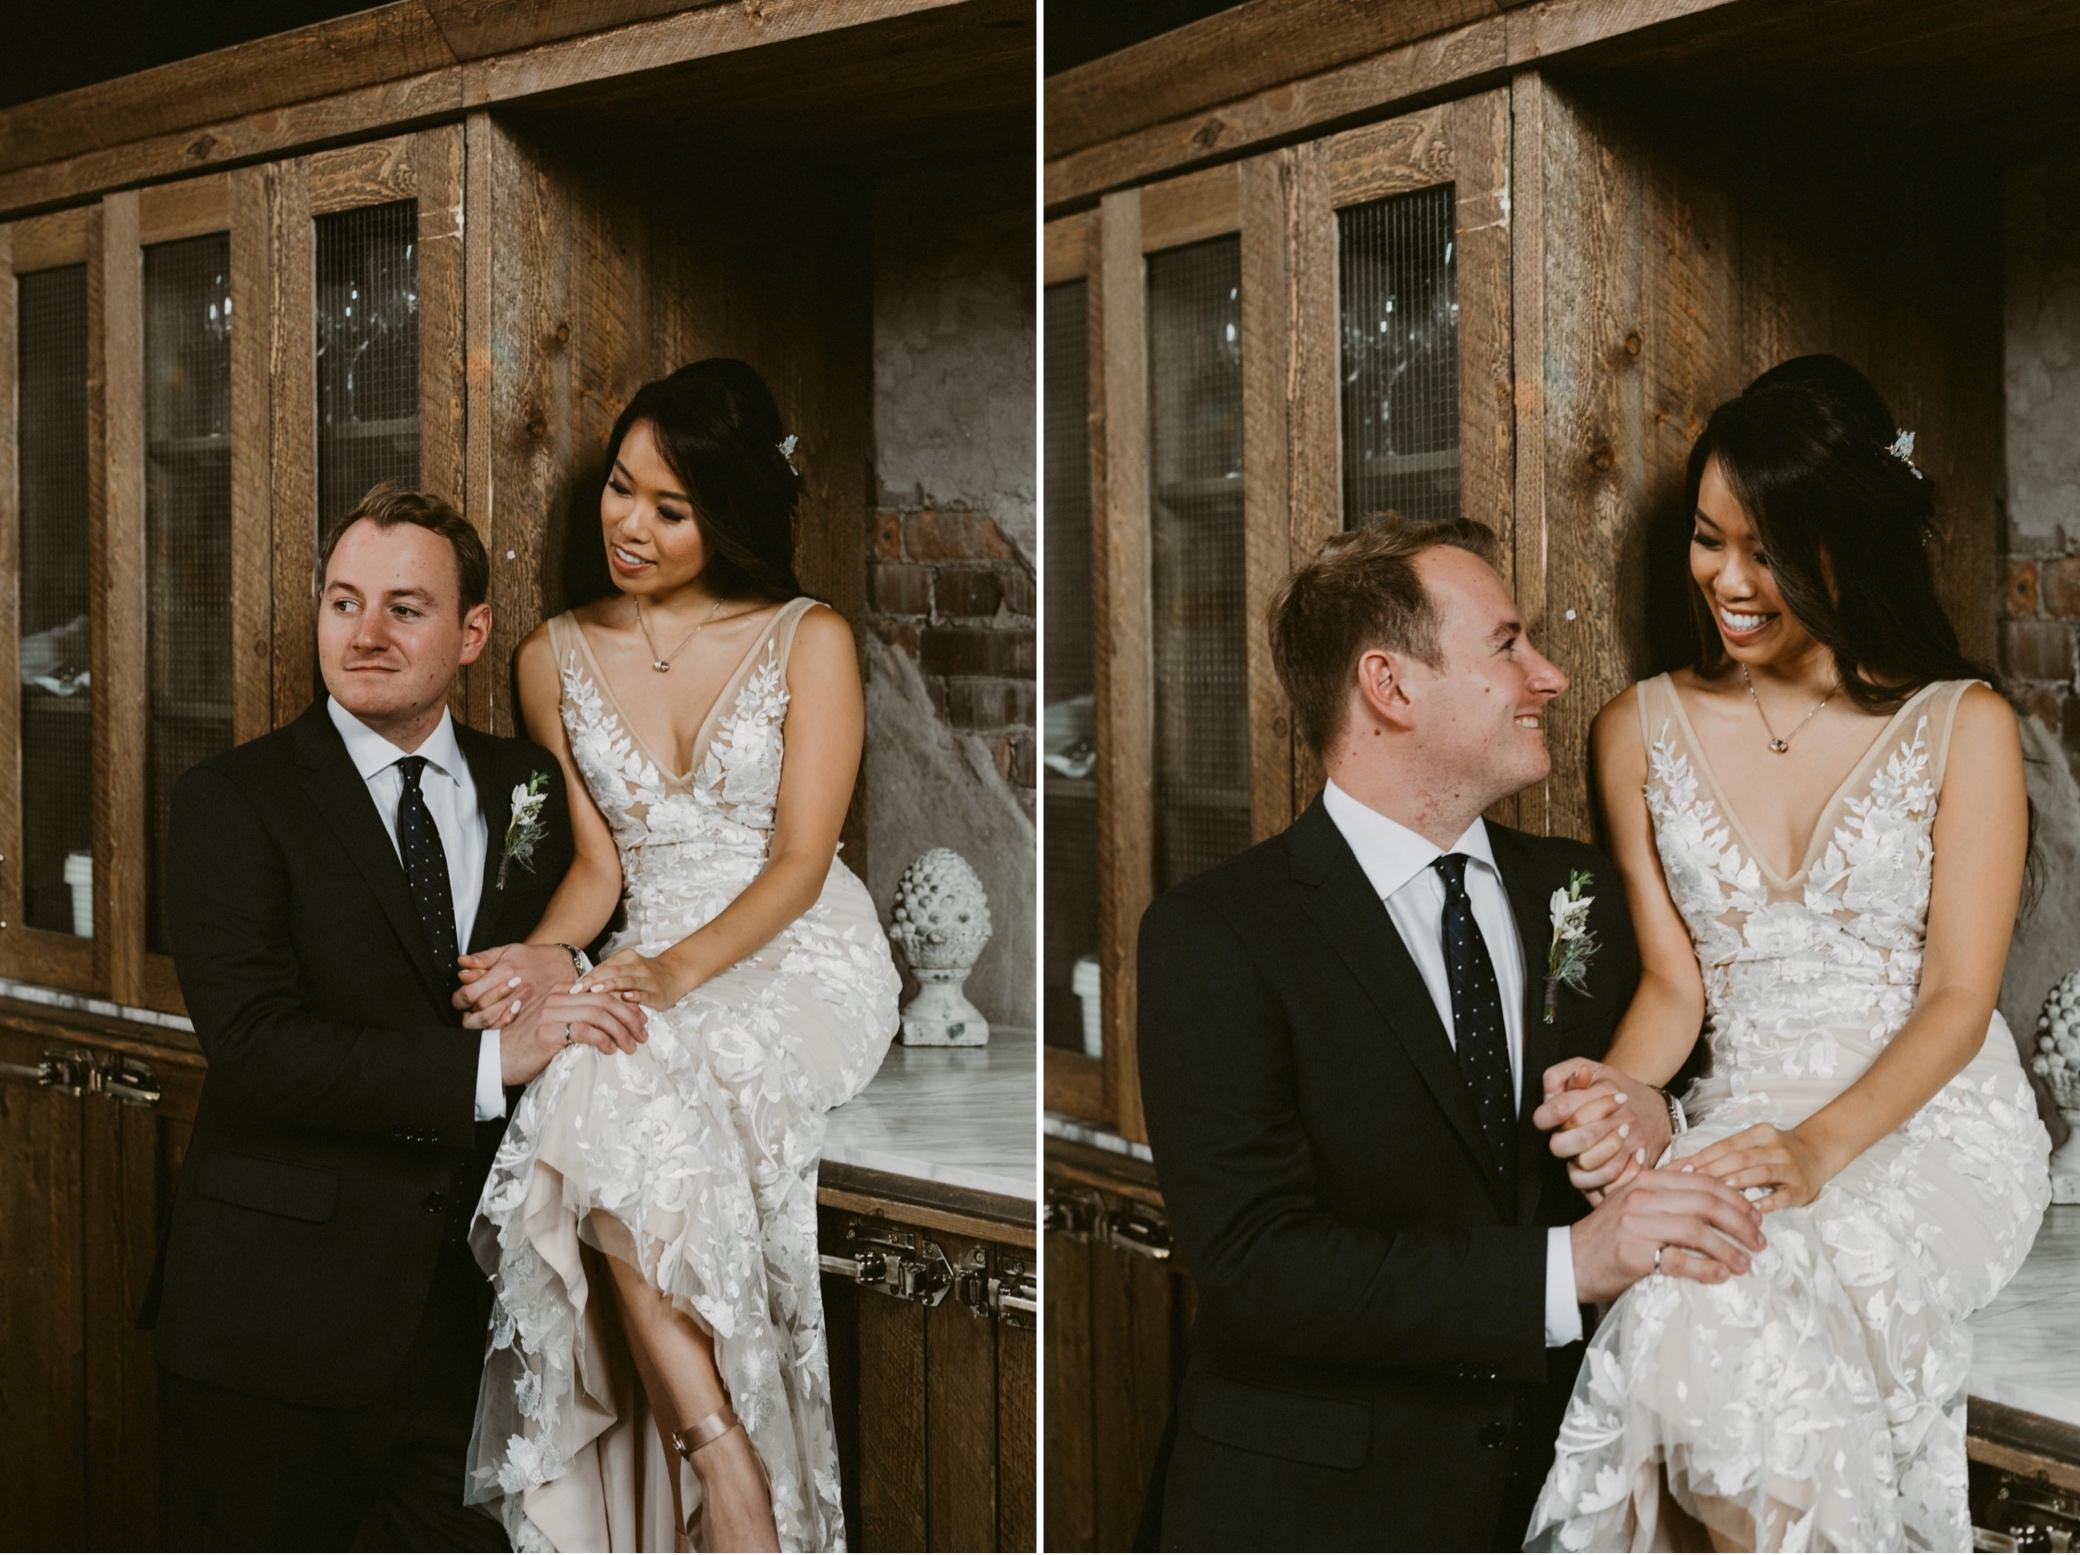 052_The Broadview Hotel Wedding (350 of 913)_The Broadview Hotel Wedding (349 of 913).jpg